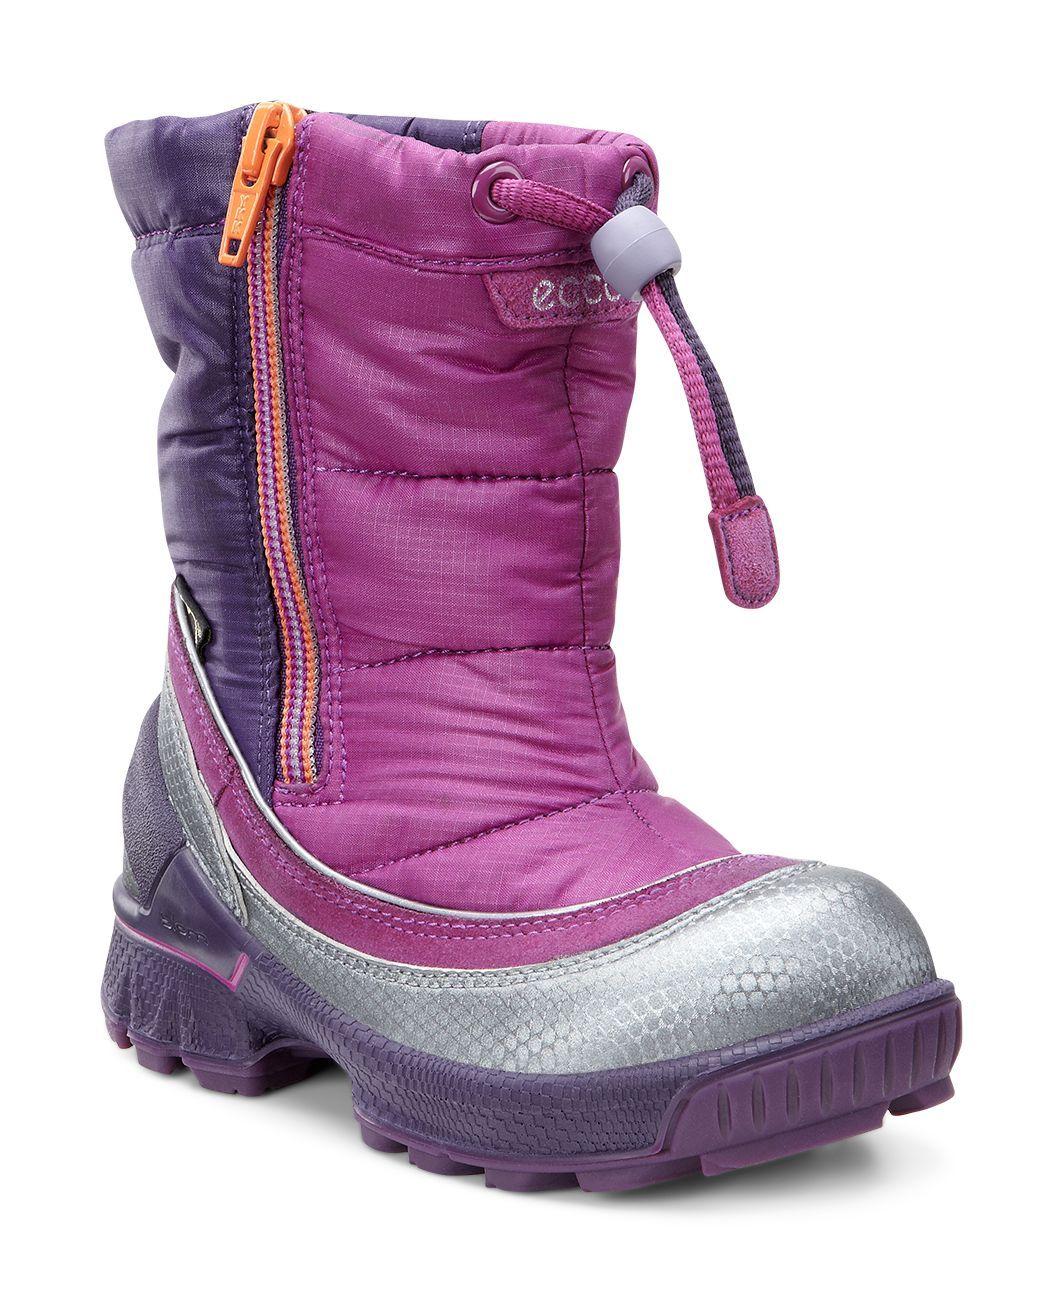 Ecco Kid´s Biom Lite Infants Boot Buffed Silver/Fuchsia/Fuchsia-30